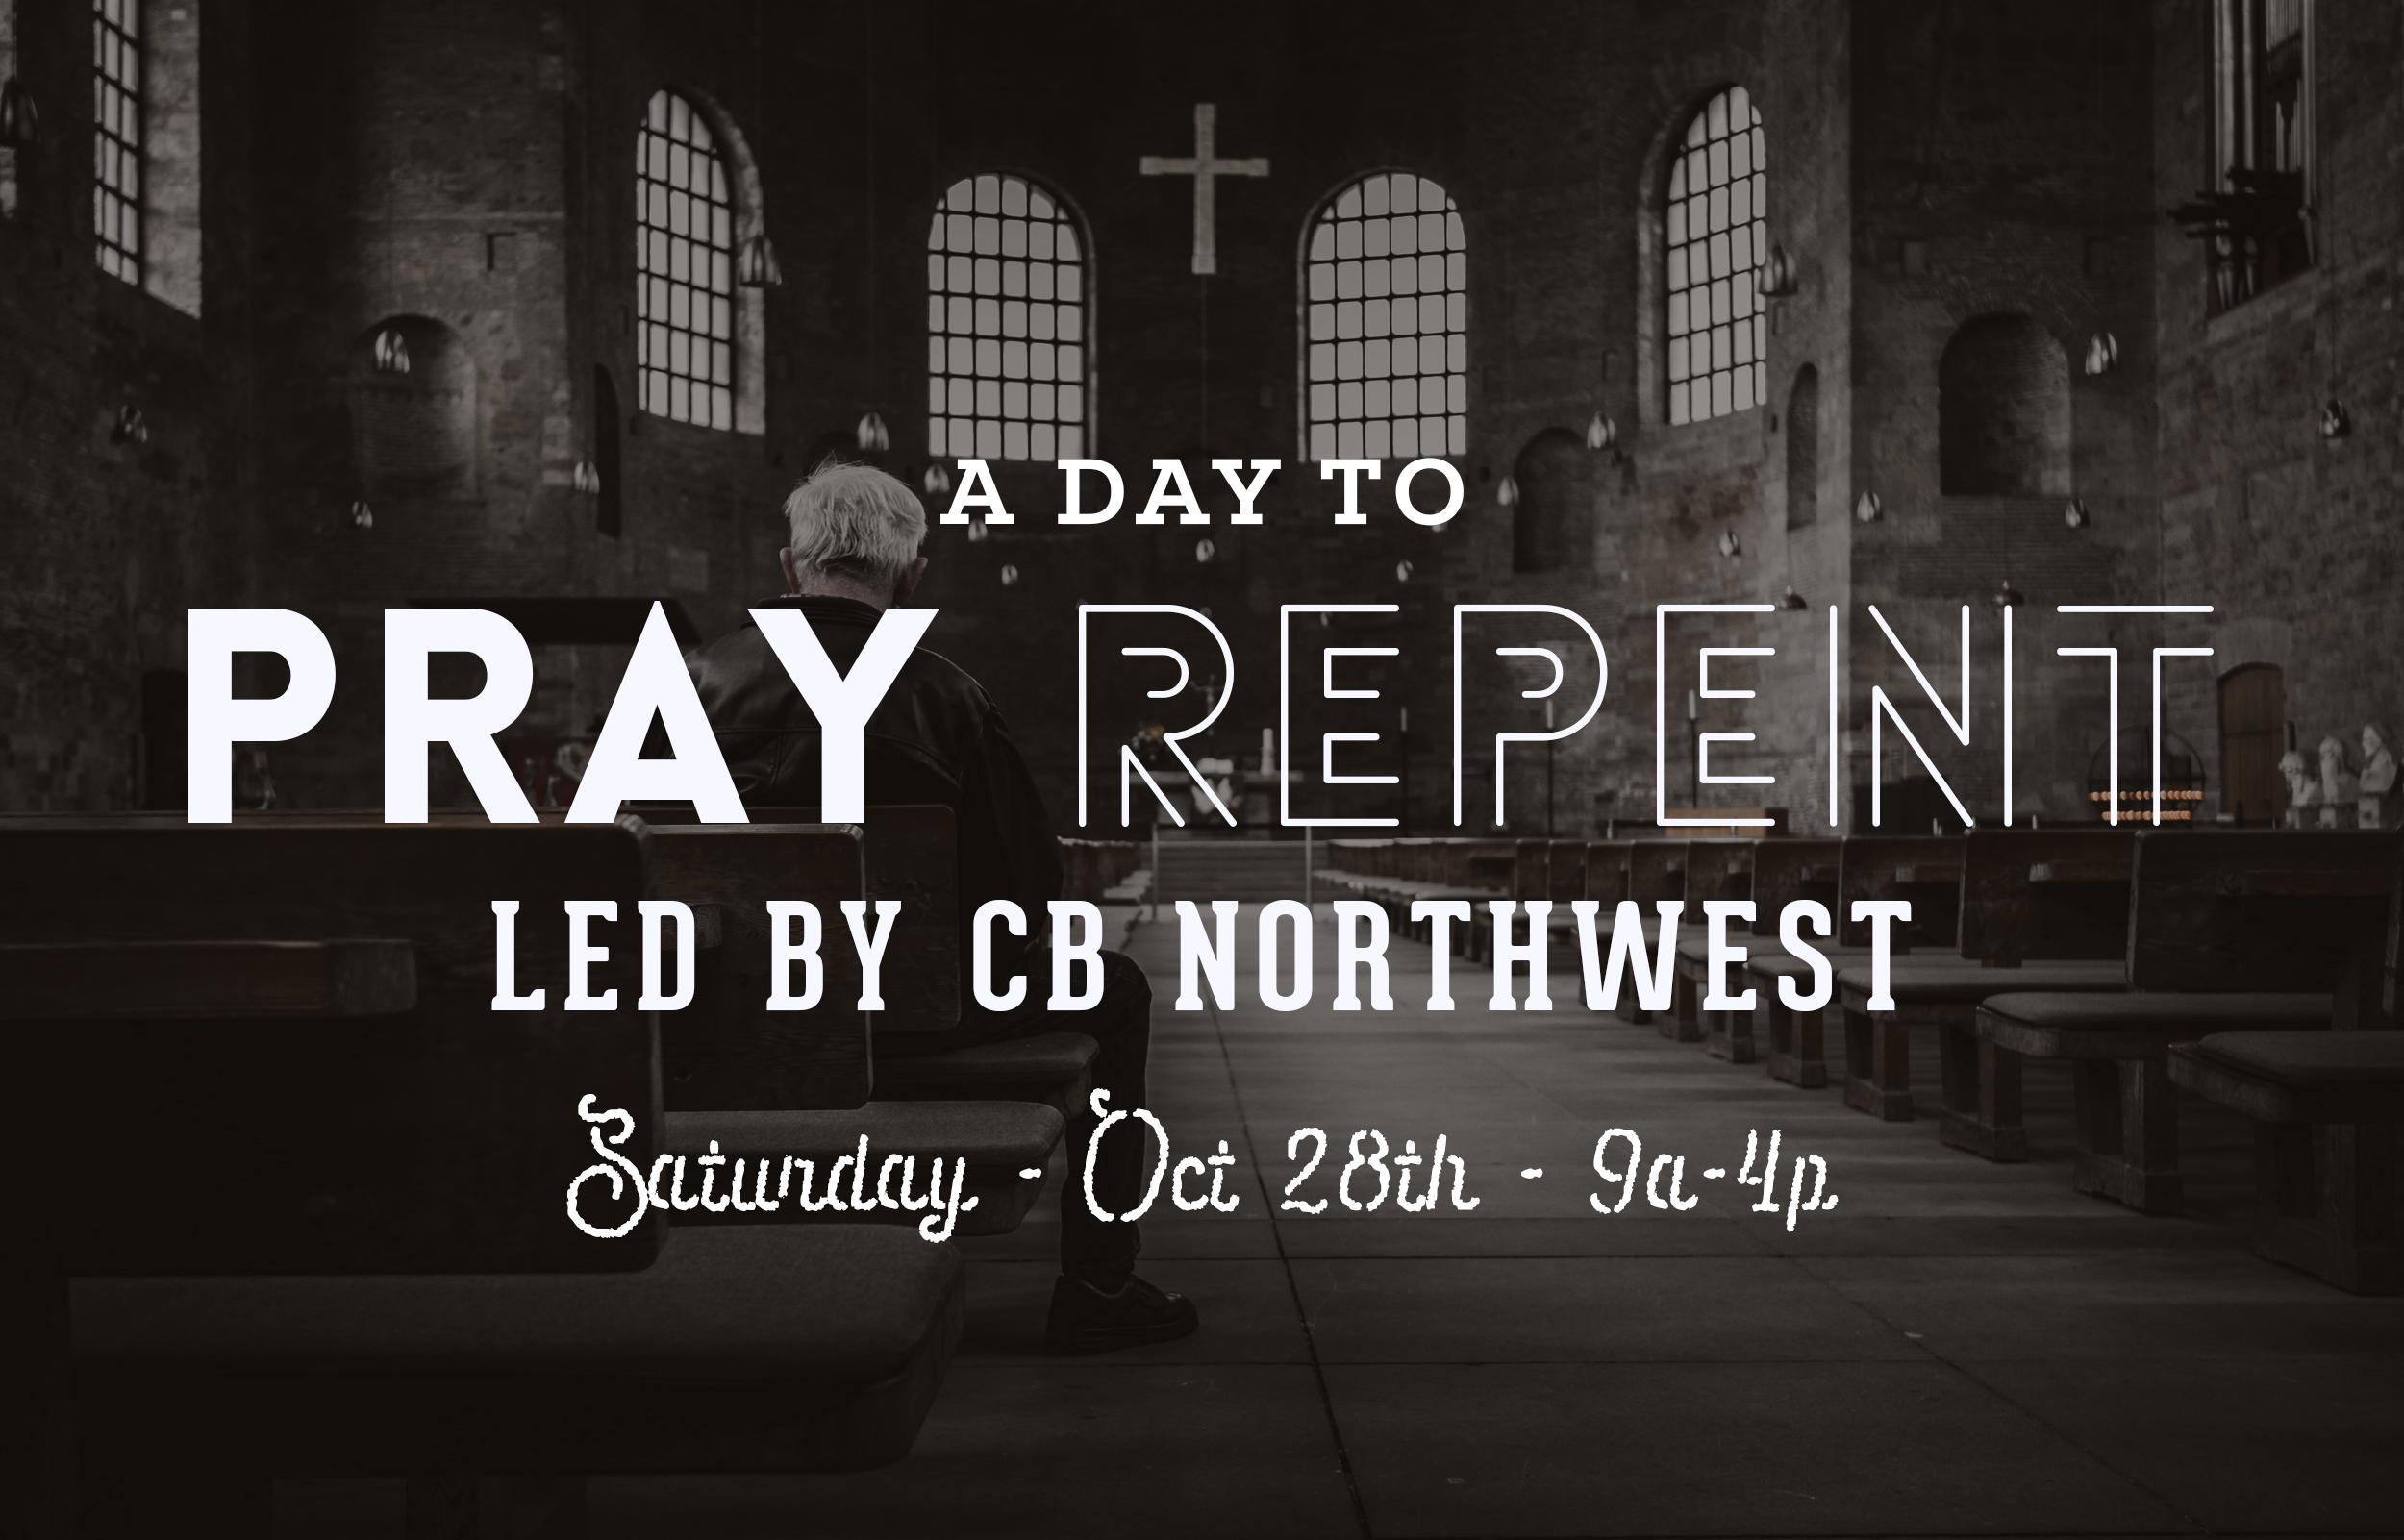 Pray repent